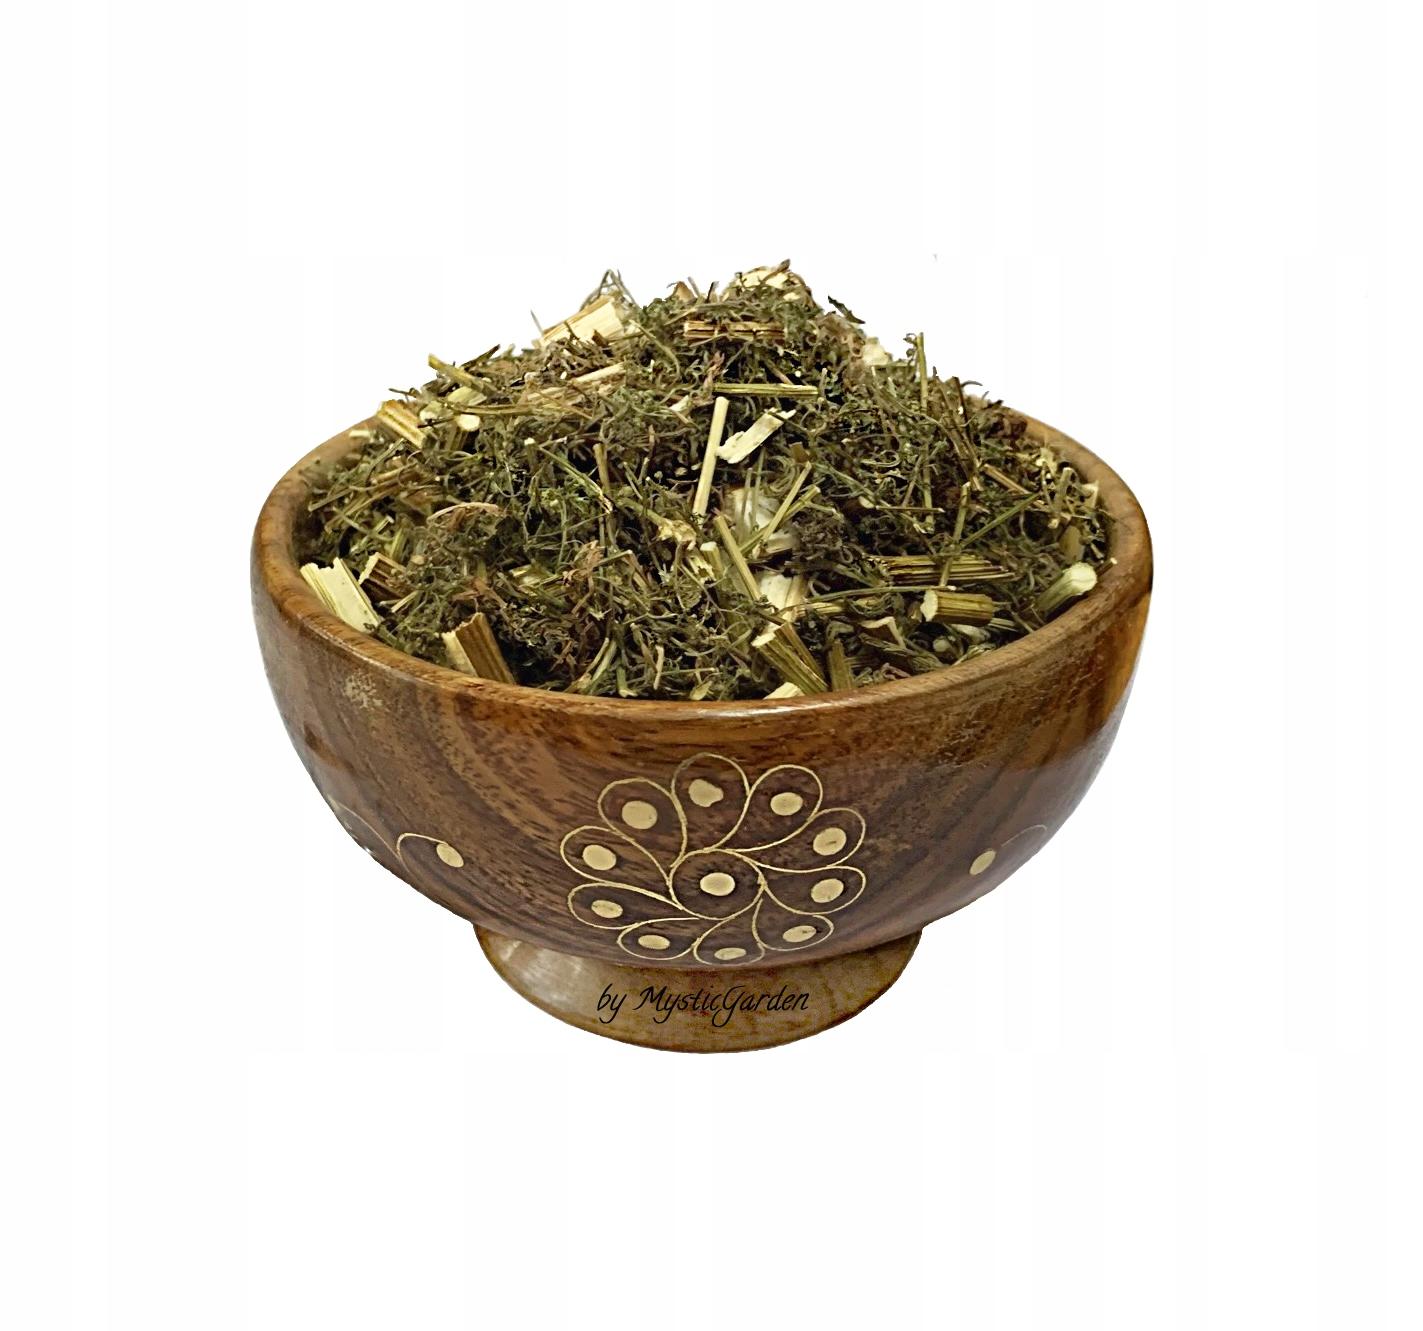 Трава полыни однолетней (Artemisia annua) 500 г